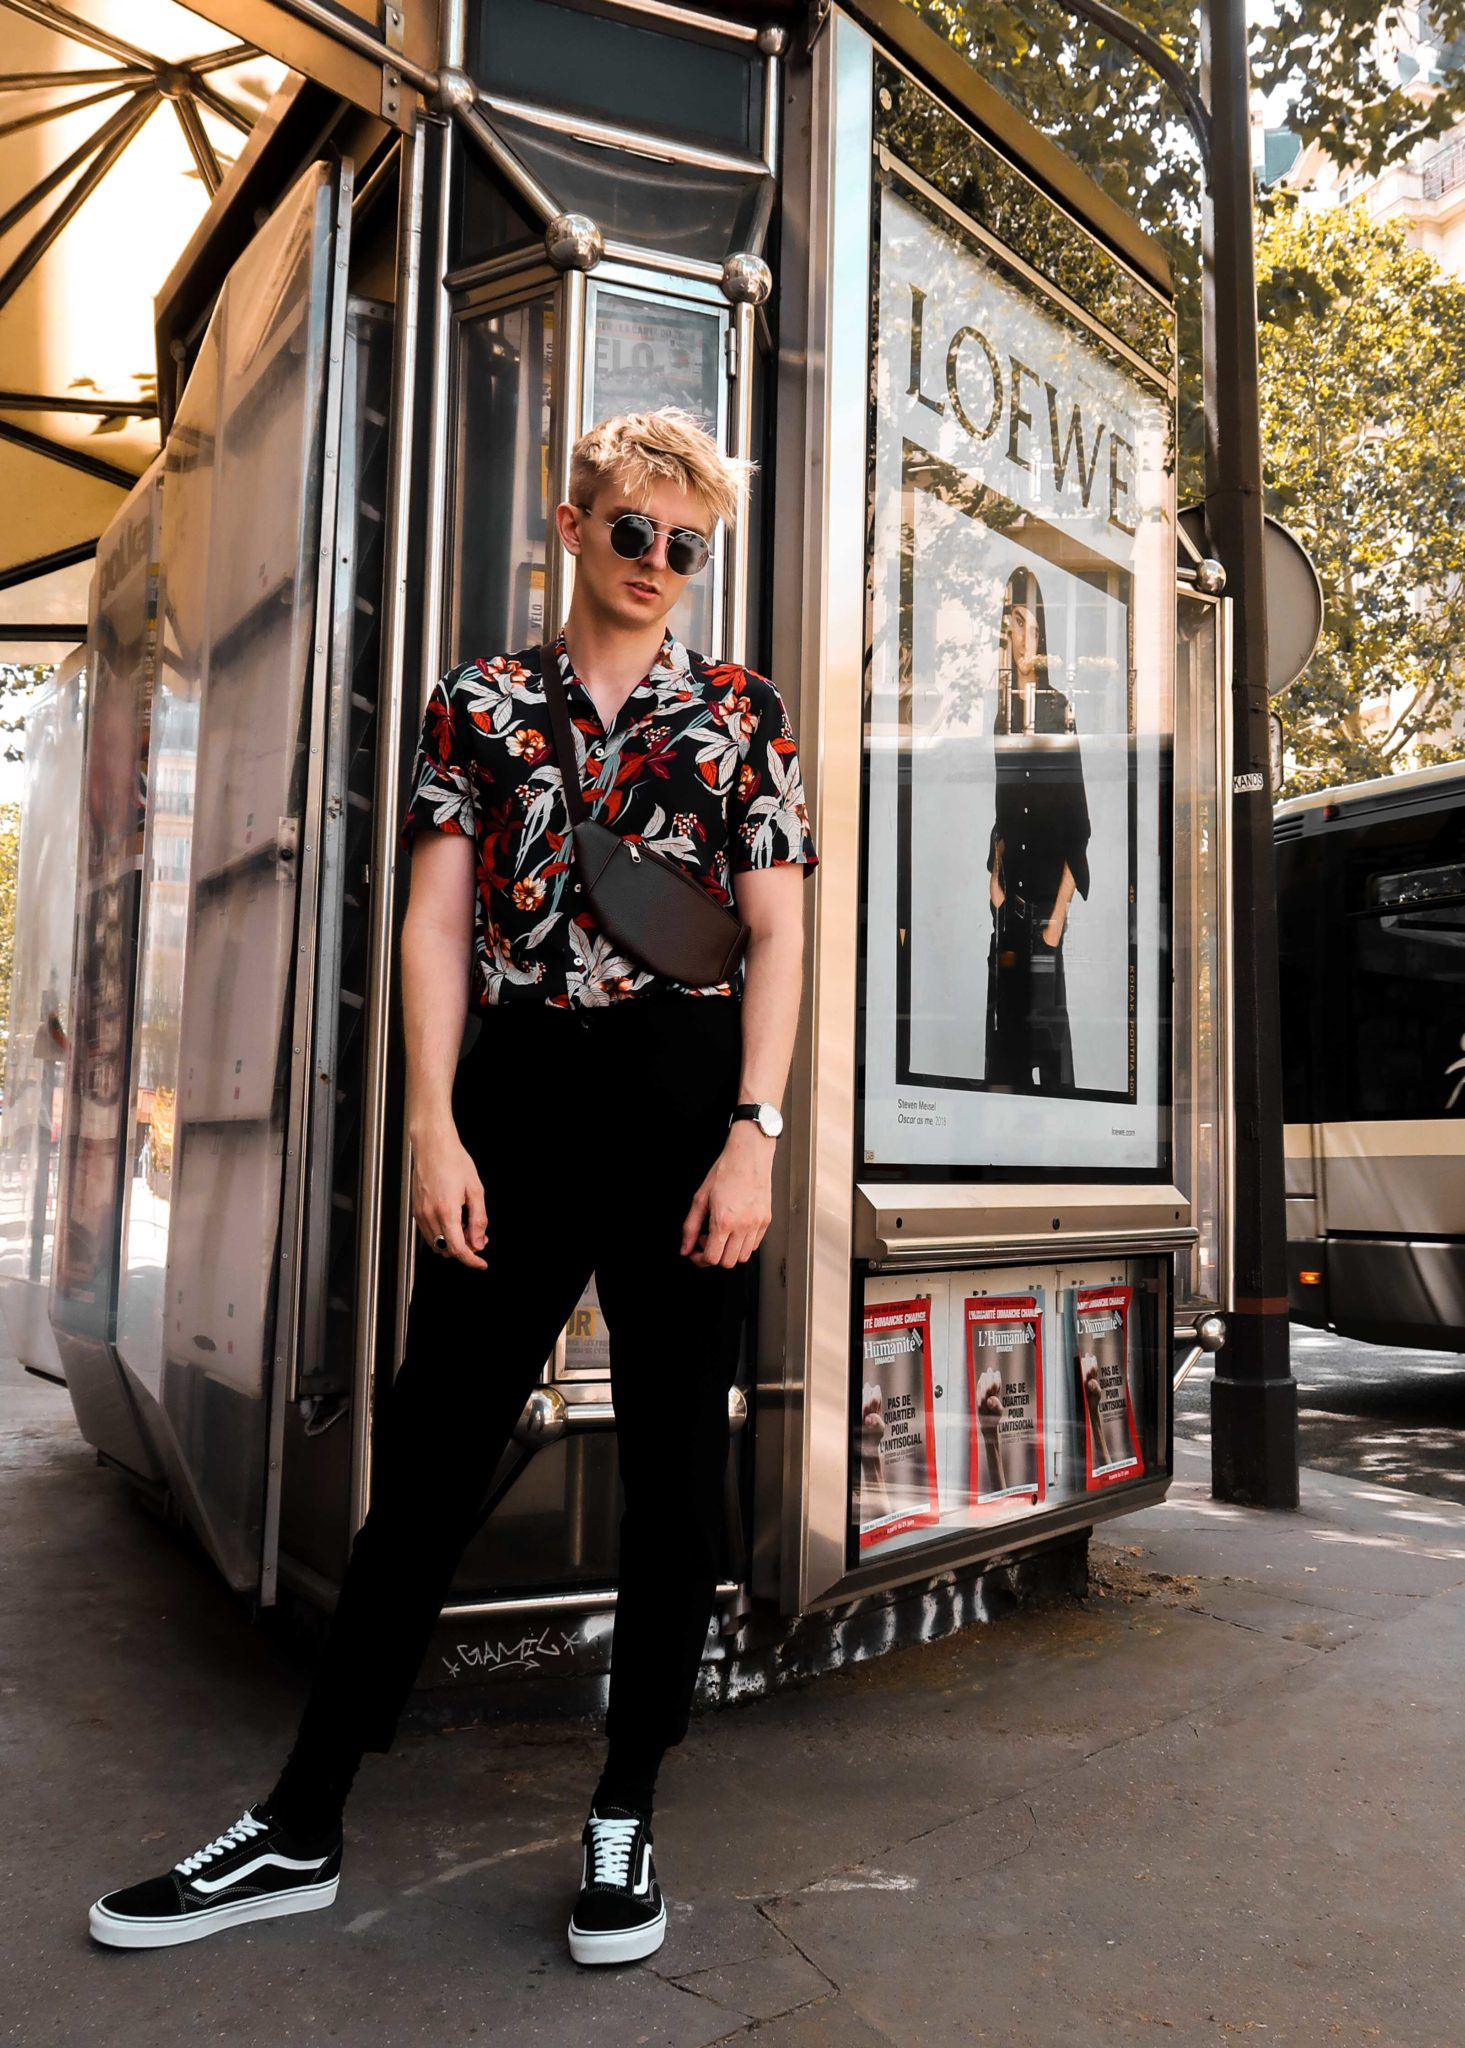 Streetstyle Paris fashion week 2018 men vogue dior maurice Style BLOG MODE HOMME